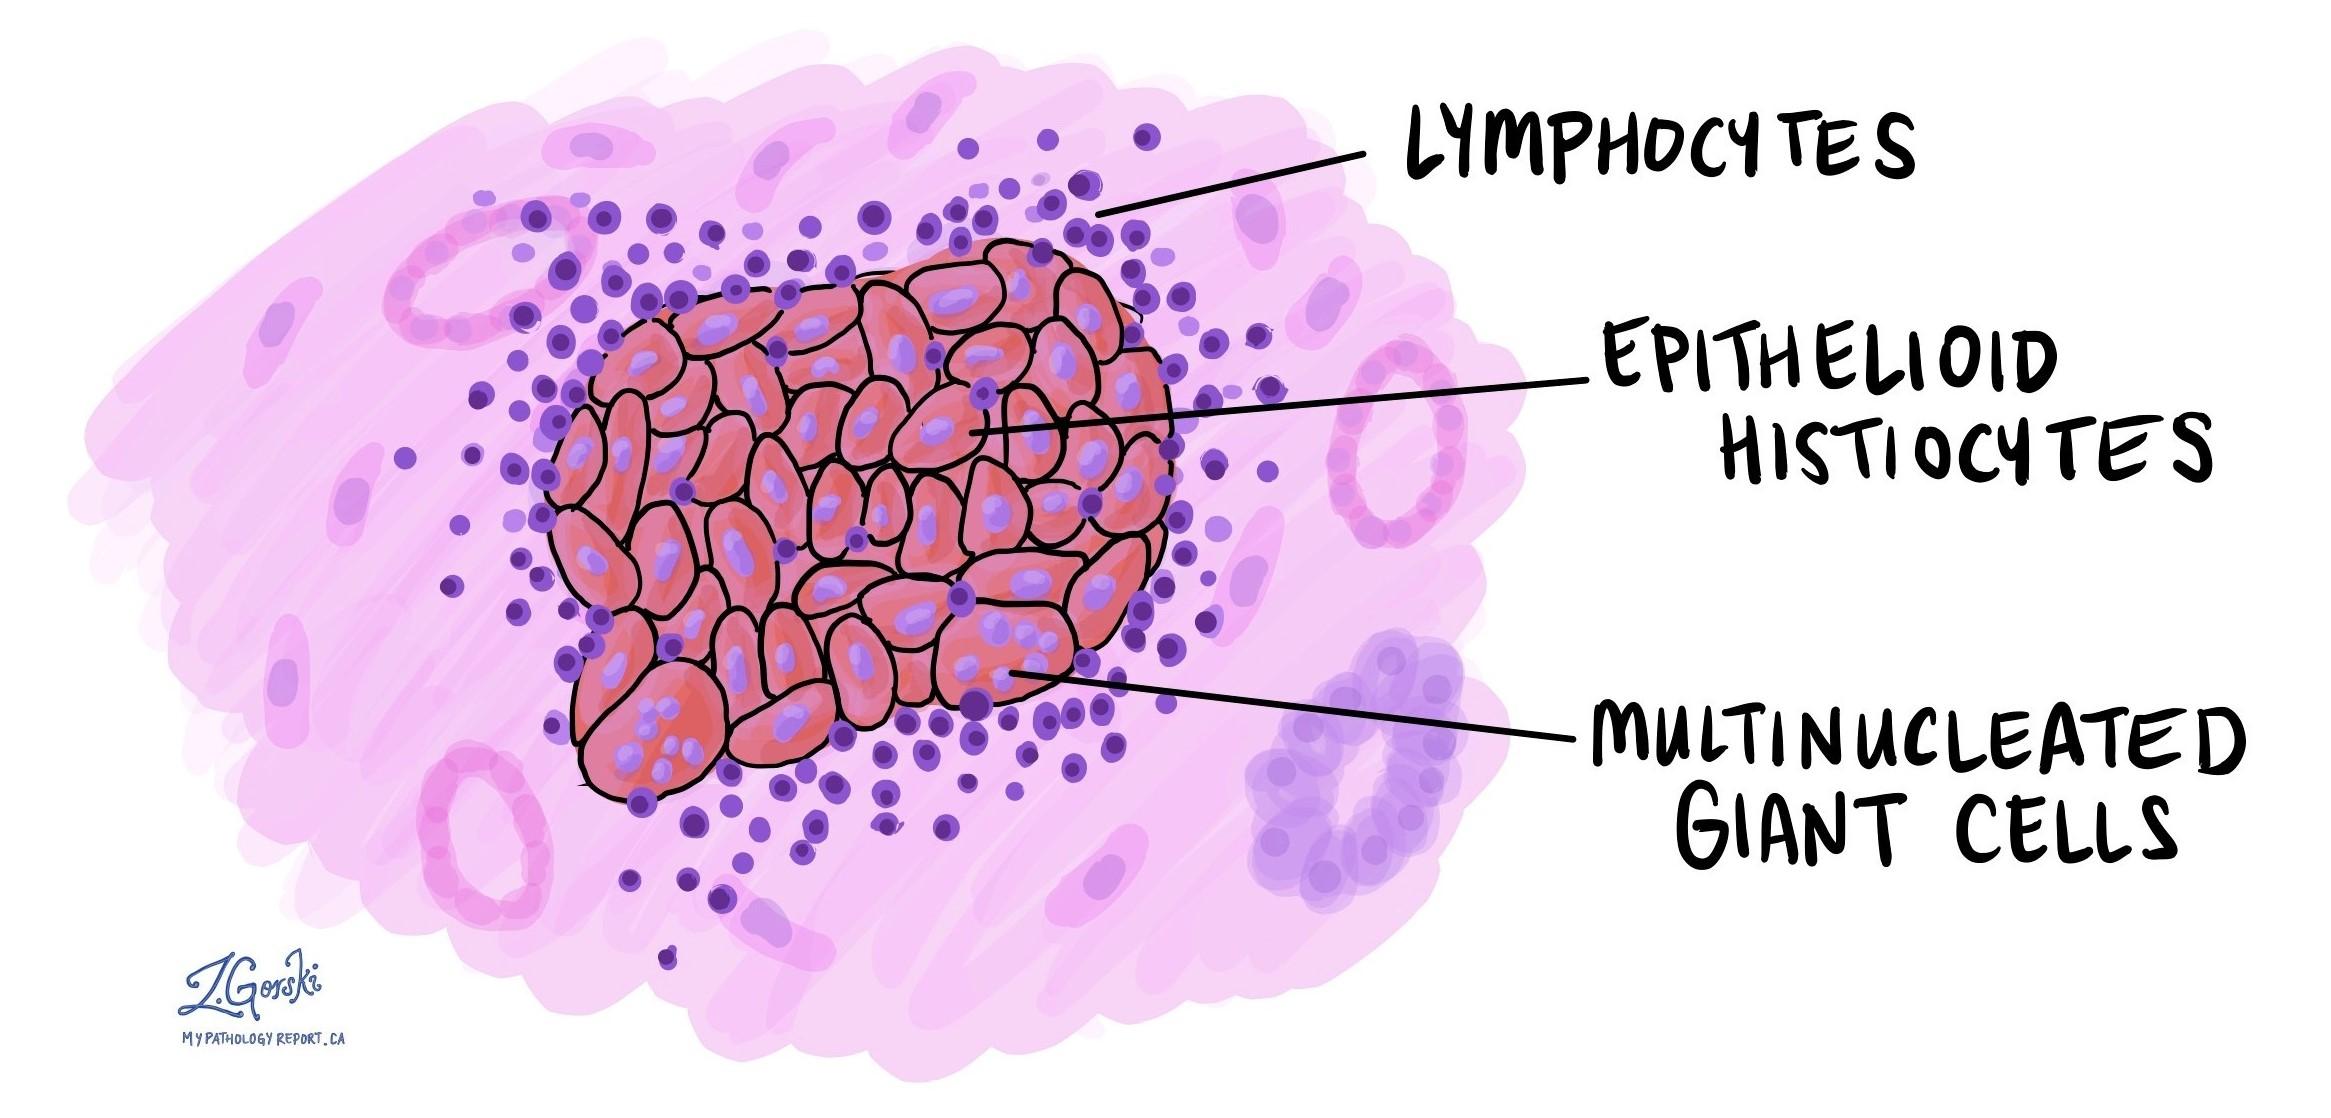 Non-necrotizing granulomatous inflammation